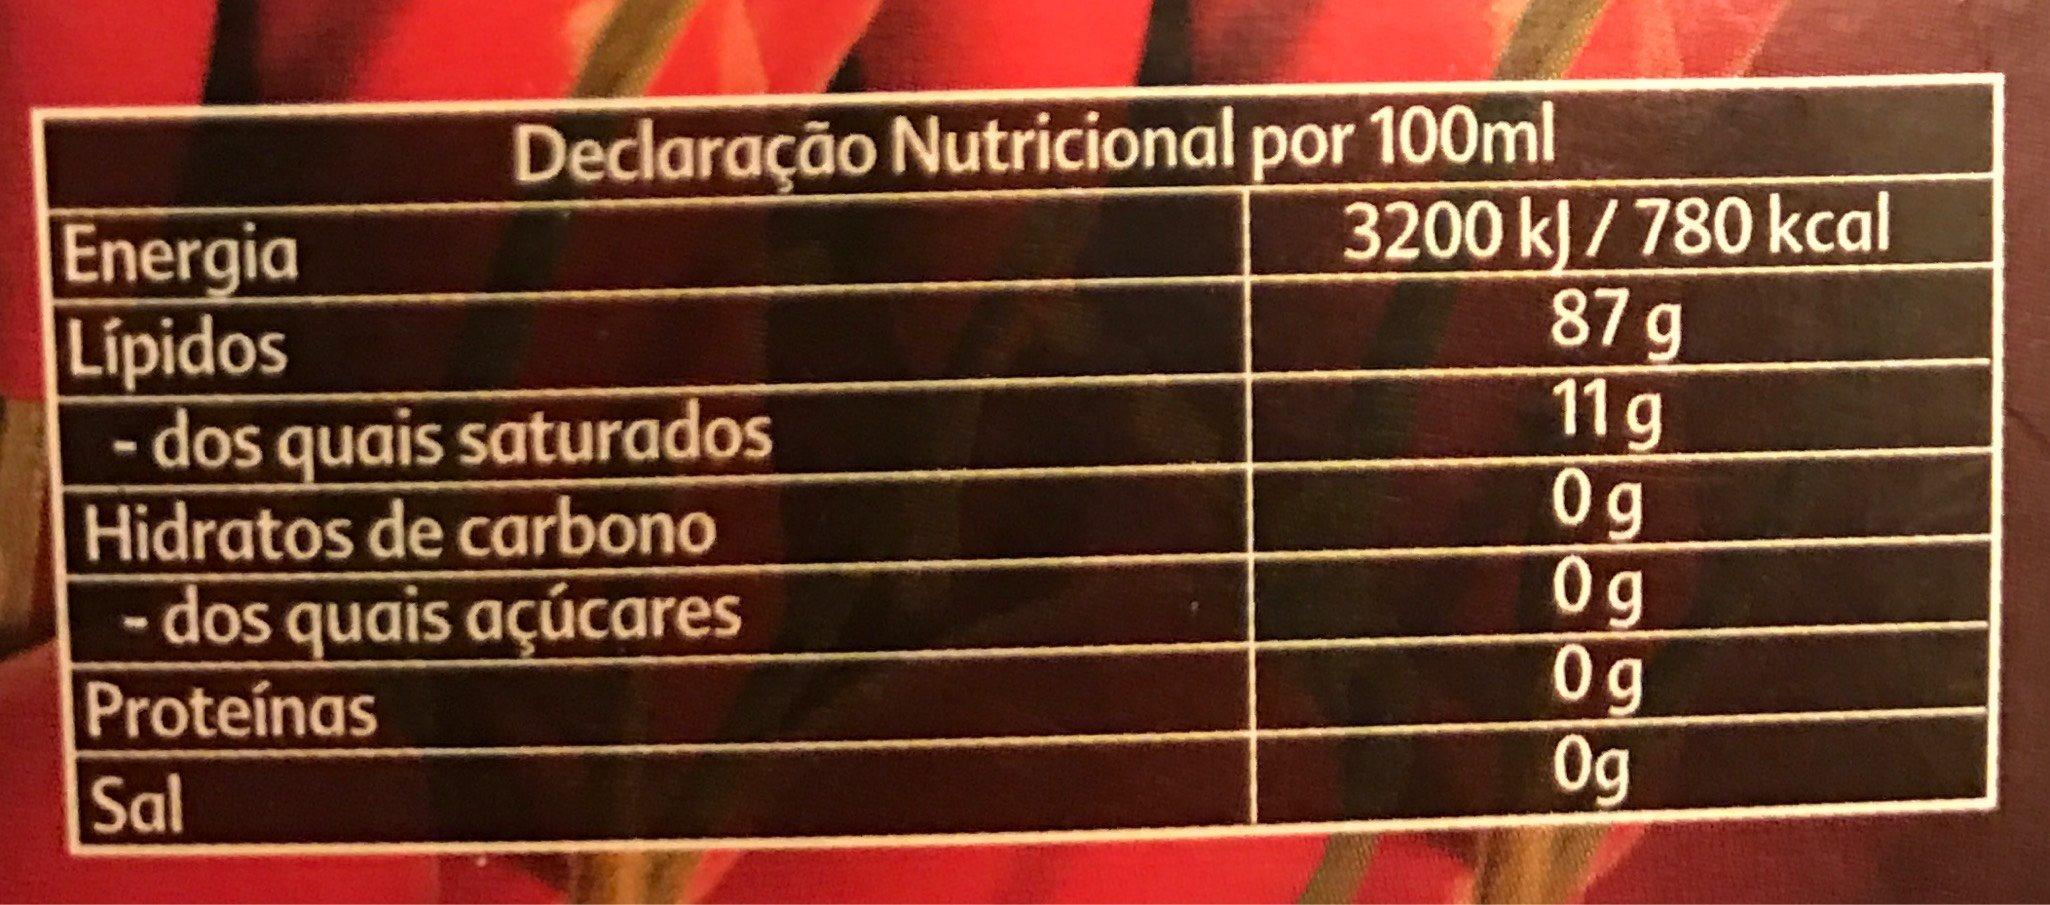 Calvé Piri piri - Informations nutritionnelles - fr